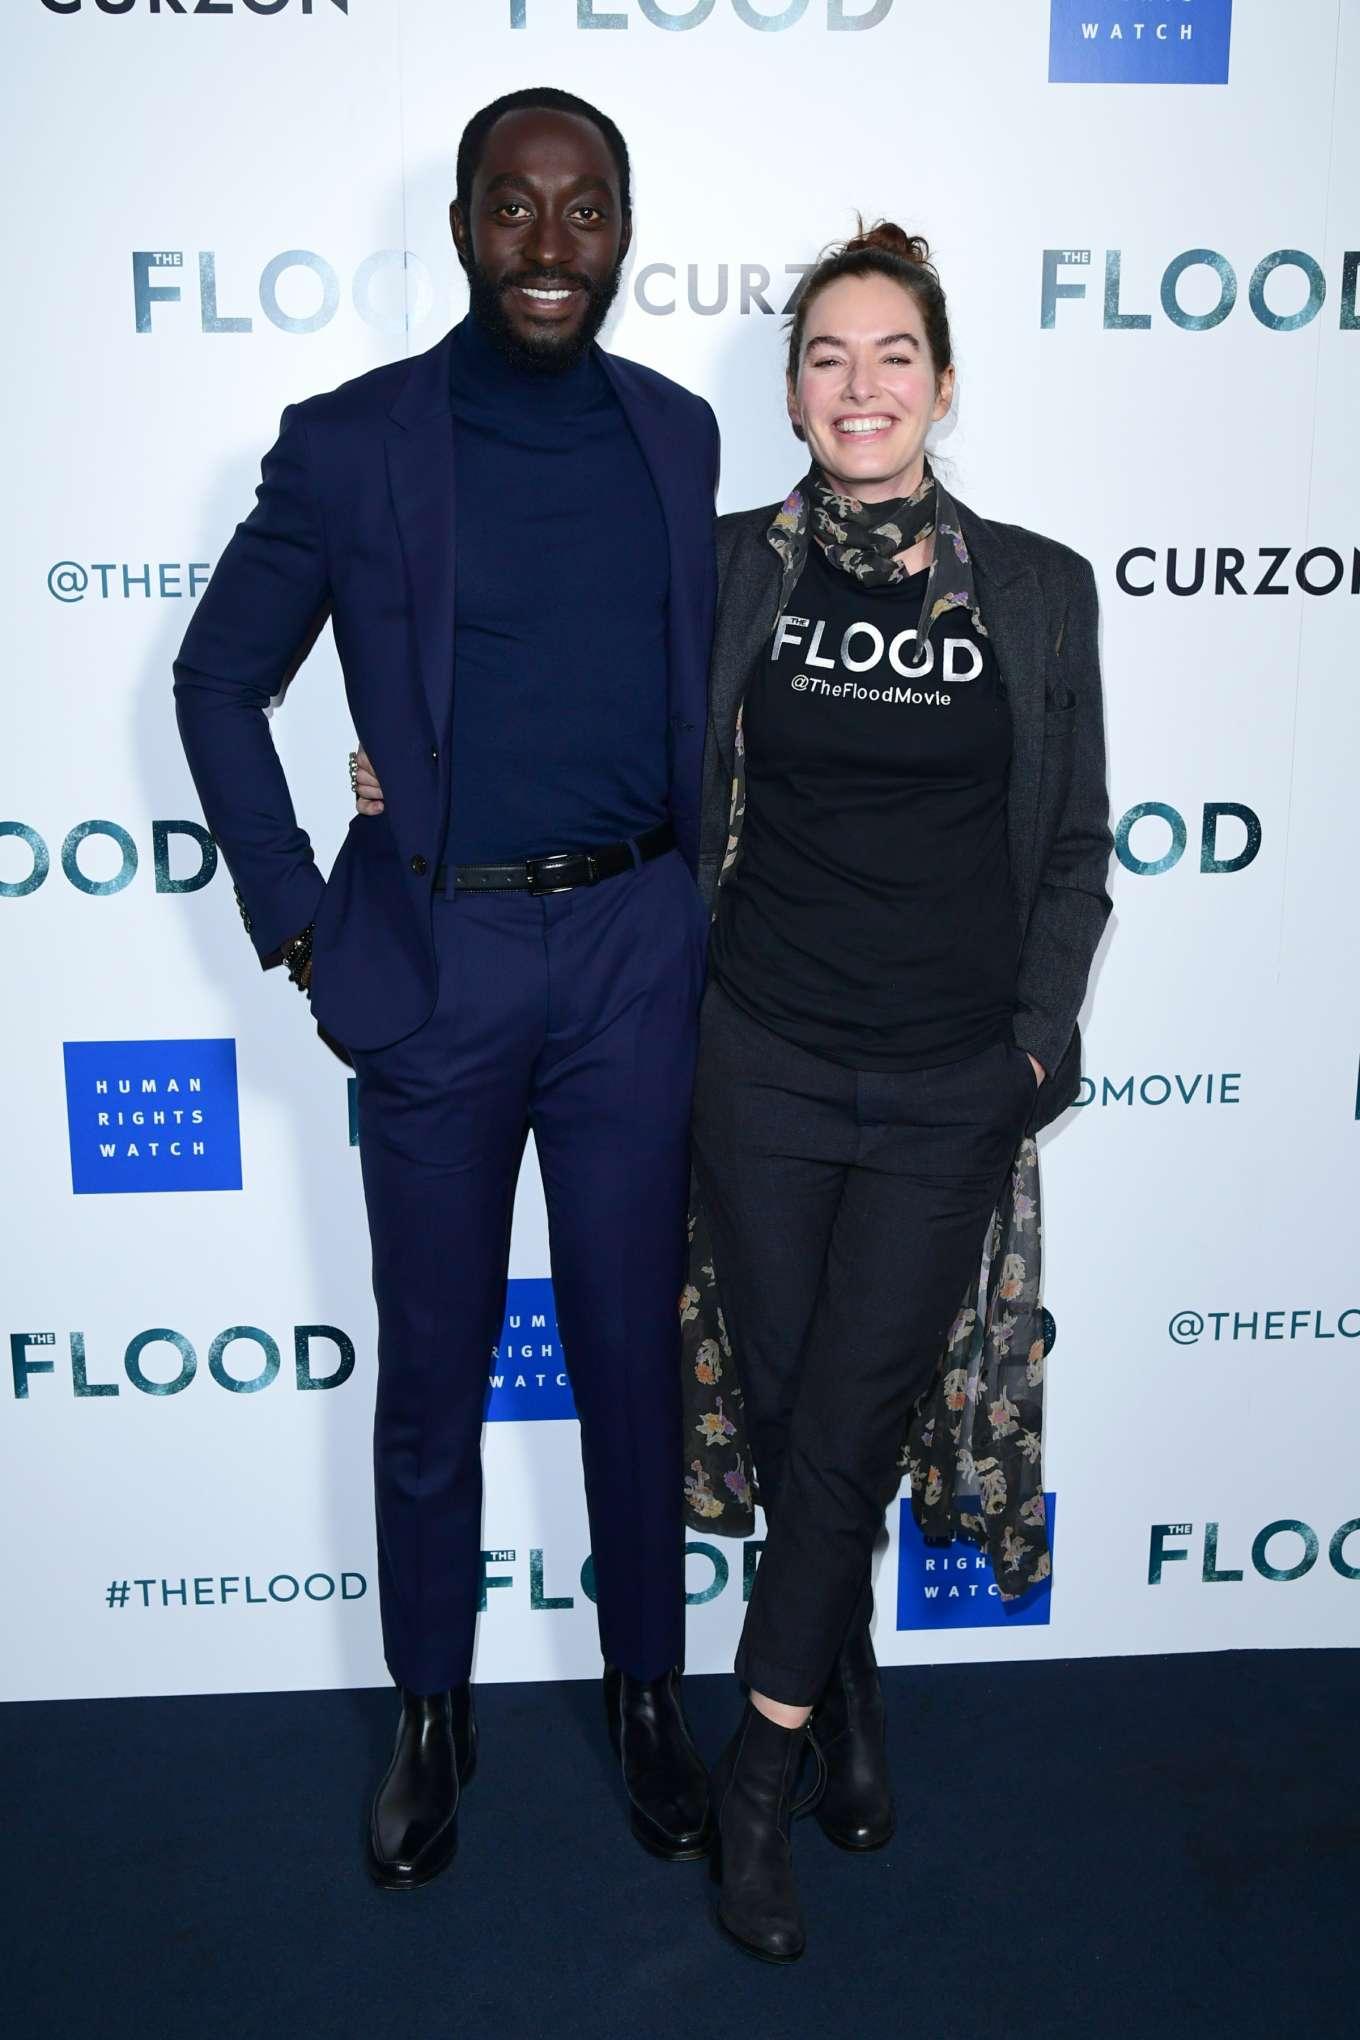 Lena Headey 2019 : Lena Headey: The Flood Screening in London-08